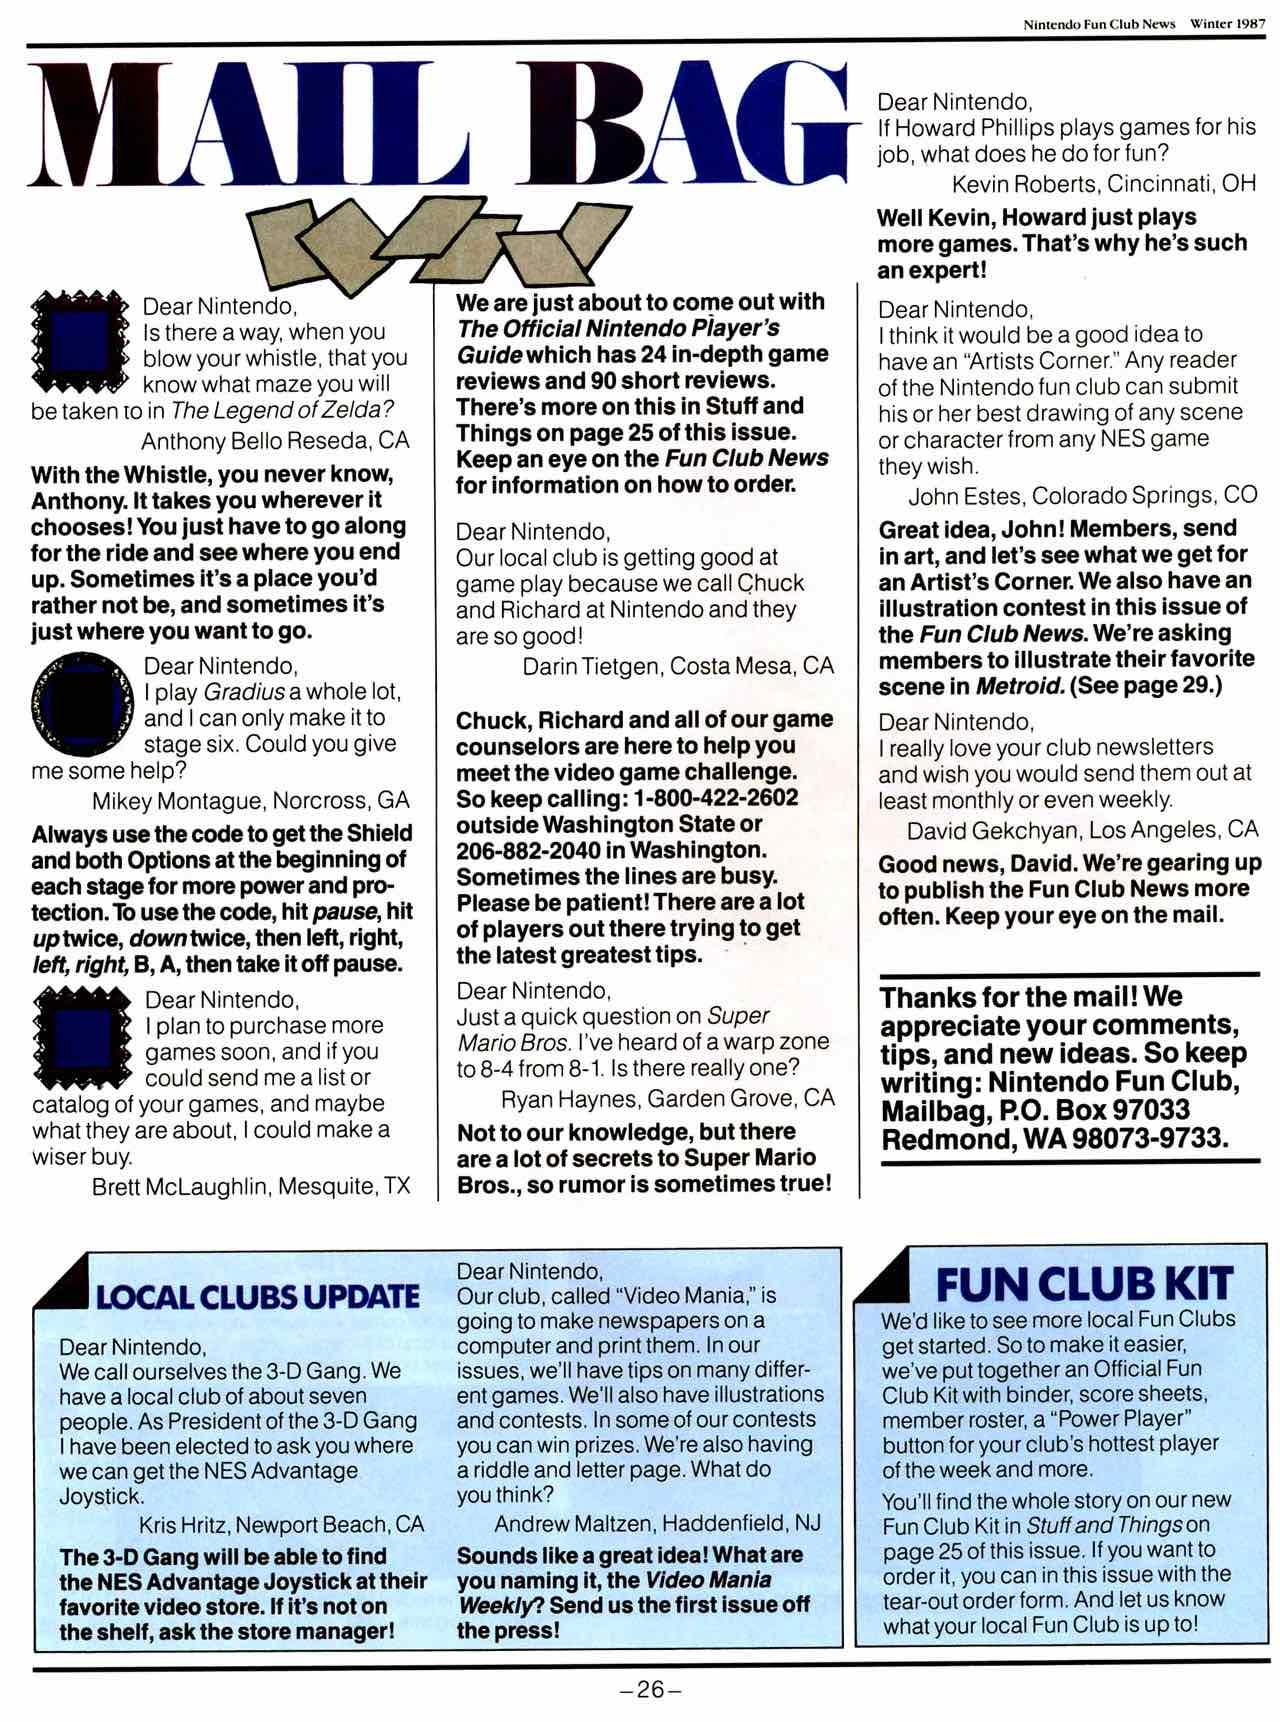 NIntendo Fun Club News | Winter 1987 - 26